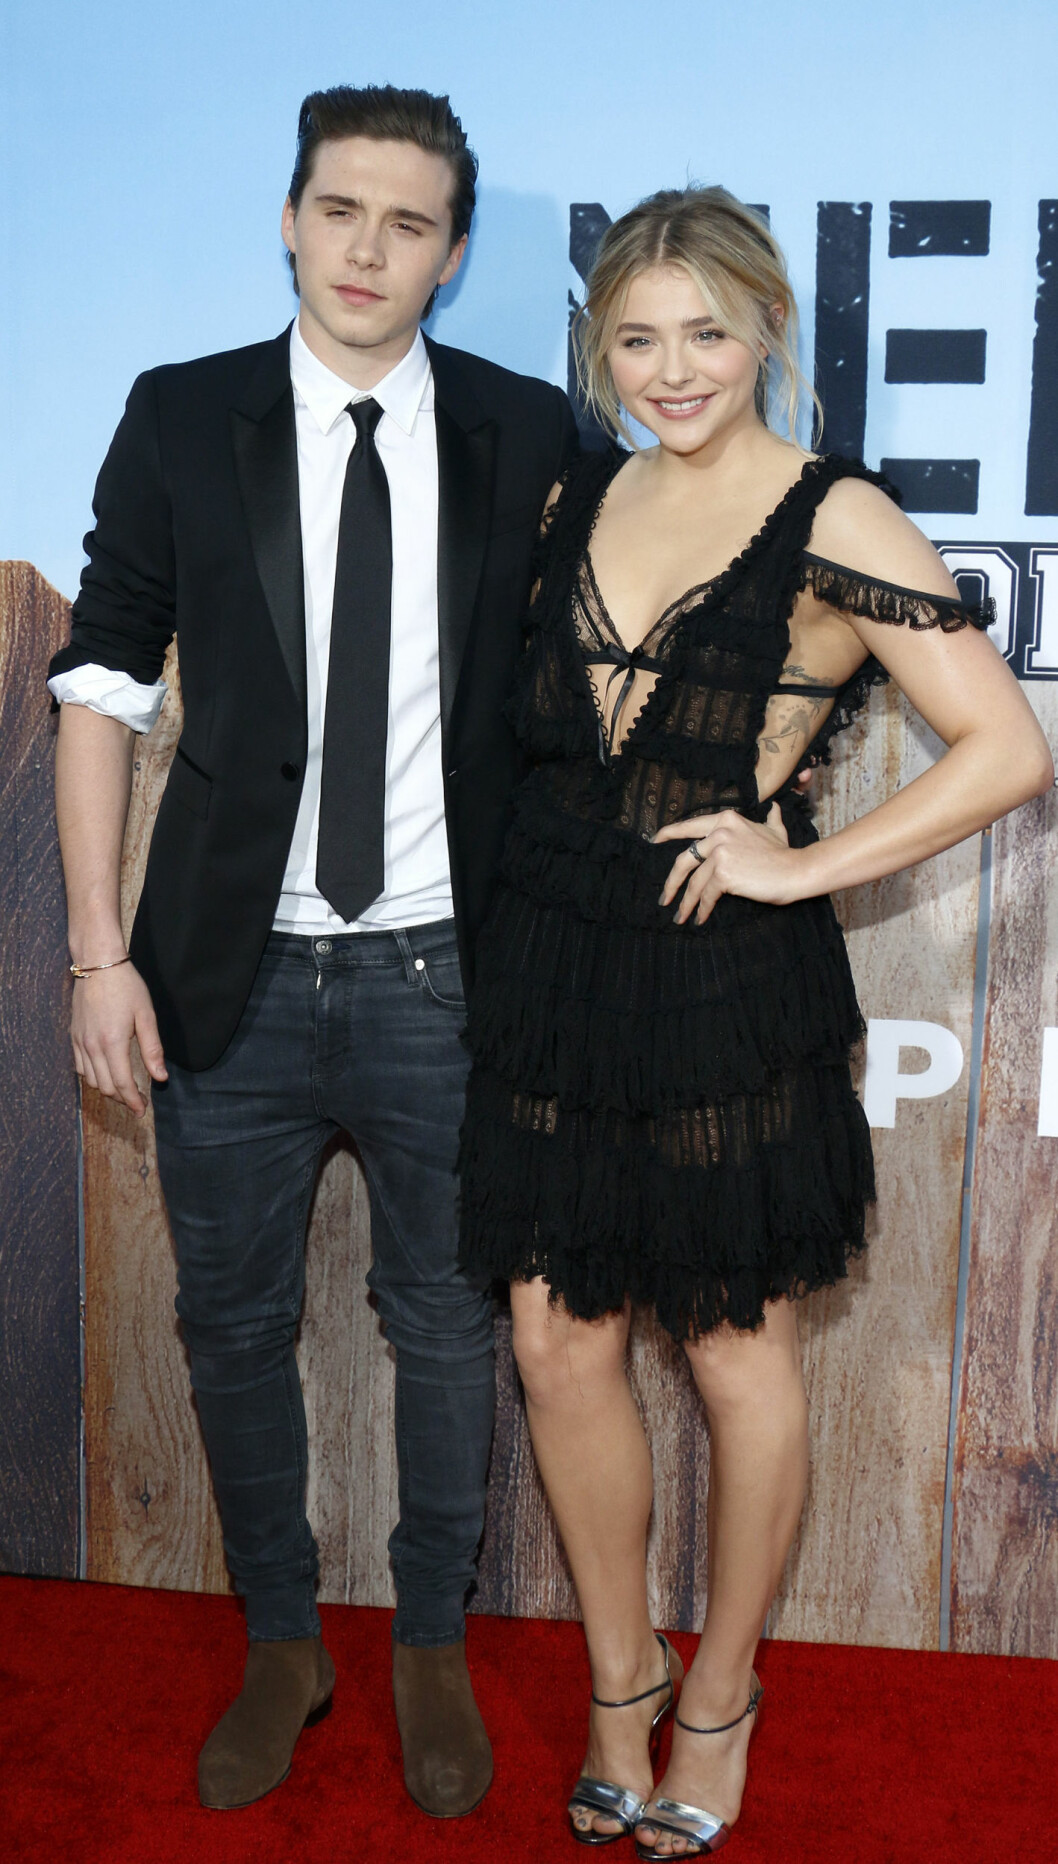 <strong>BRUDD:</strong> I mai i år bekreftet skuespiller Chloë Grace Moretz og Brooklyn Beckham at de to var et par etter at de hadde datet siden august 2014. Bare fire måneder var romansen over. Foto: NTB Scanpix